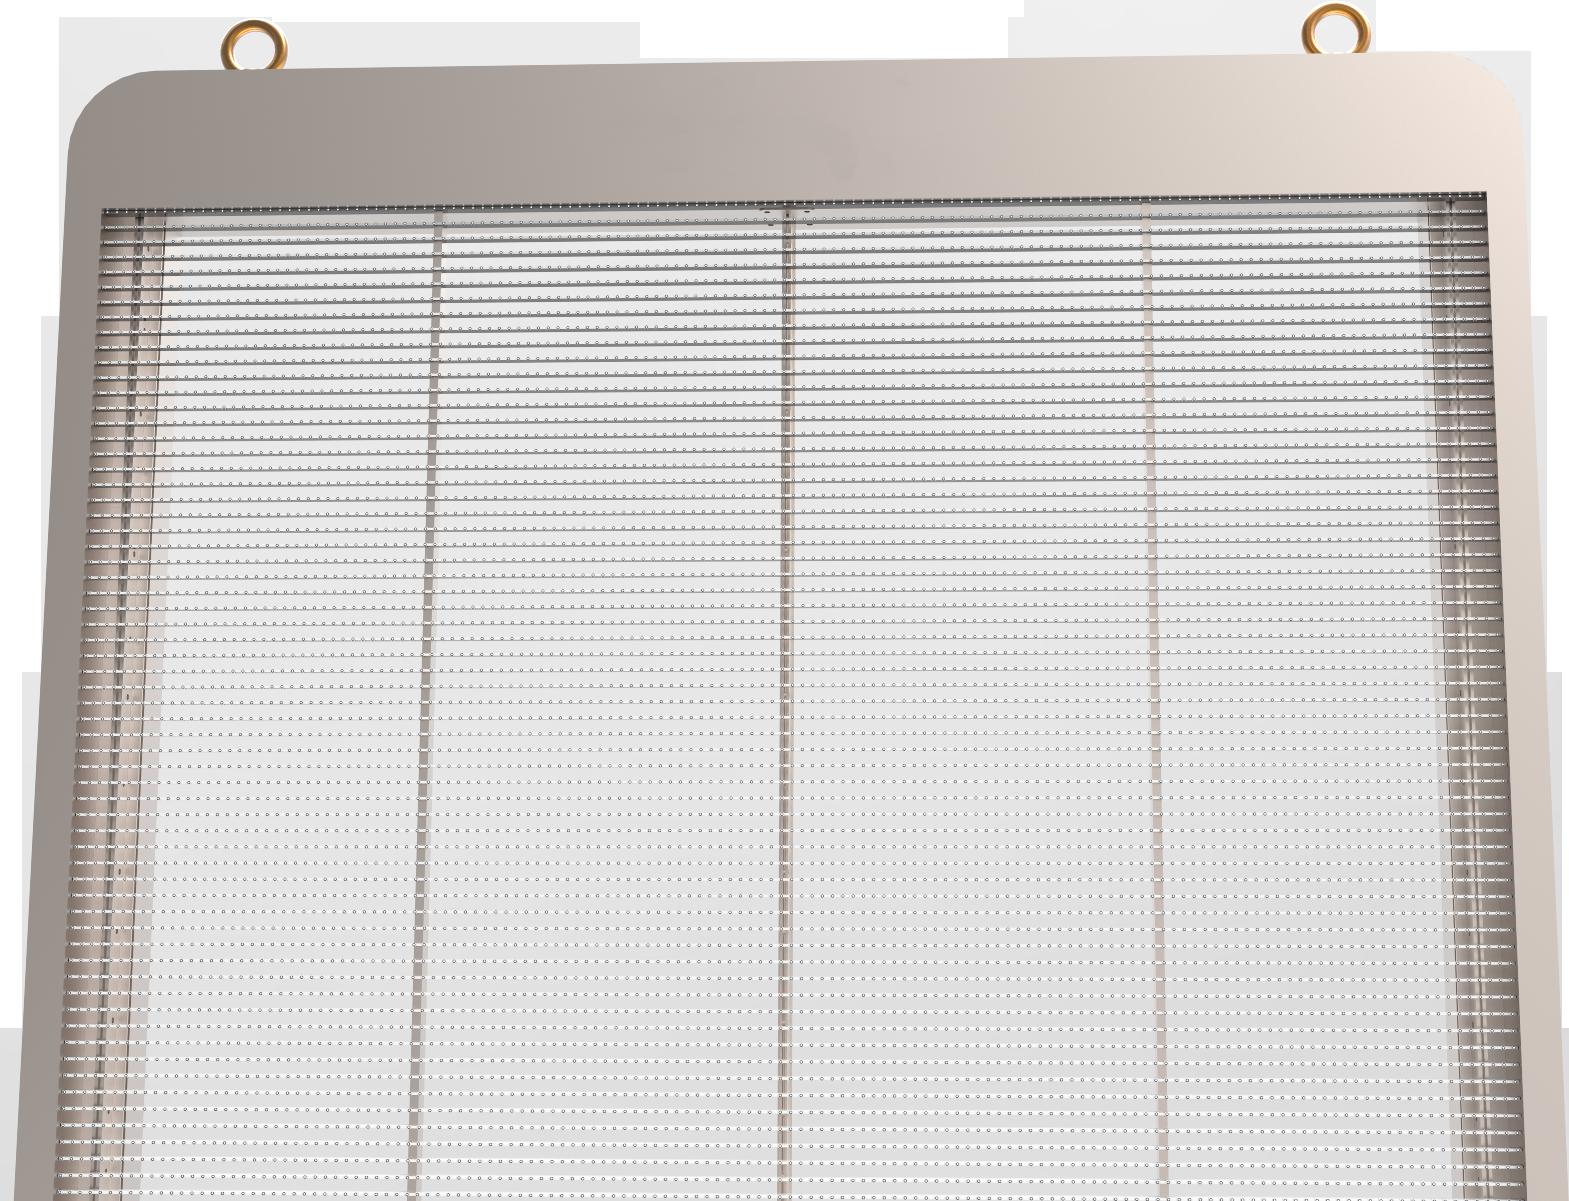 transparent led display